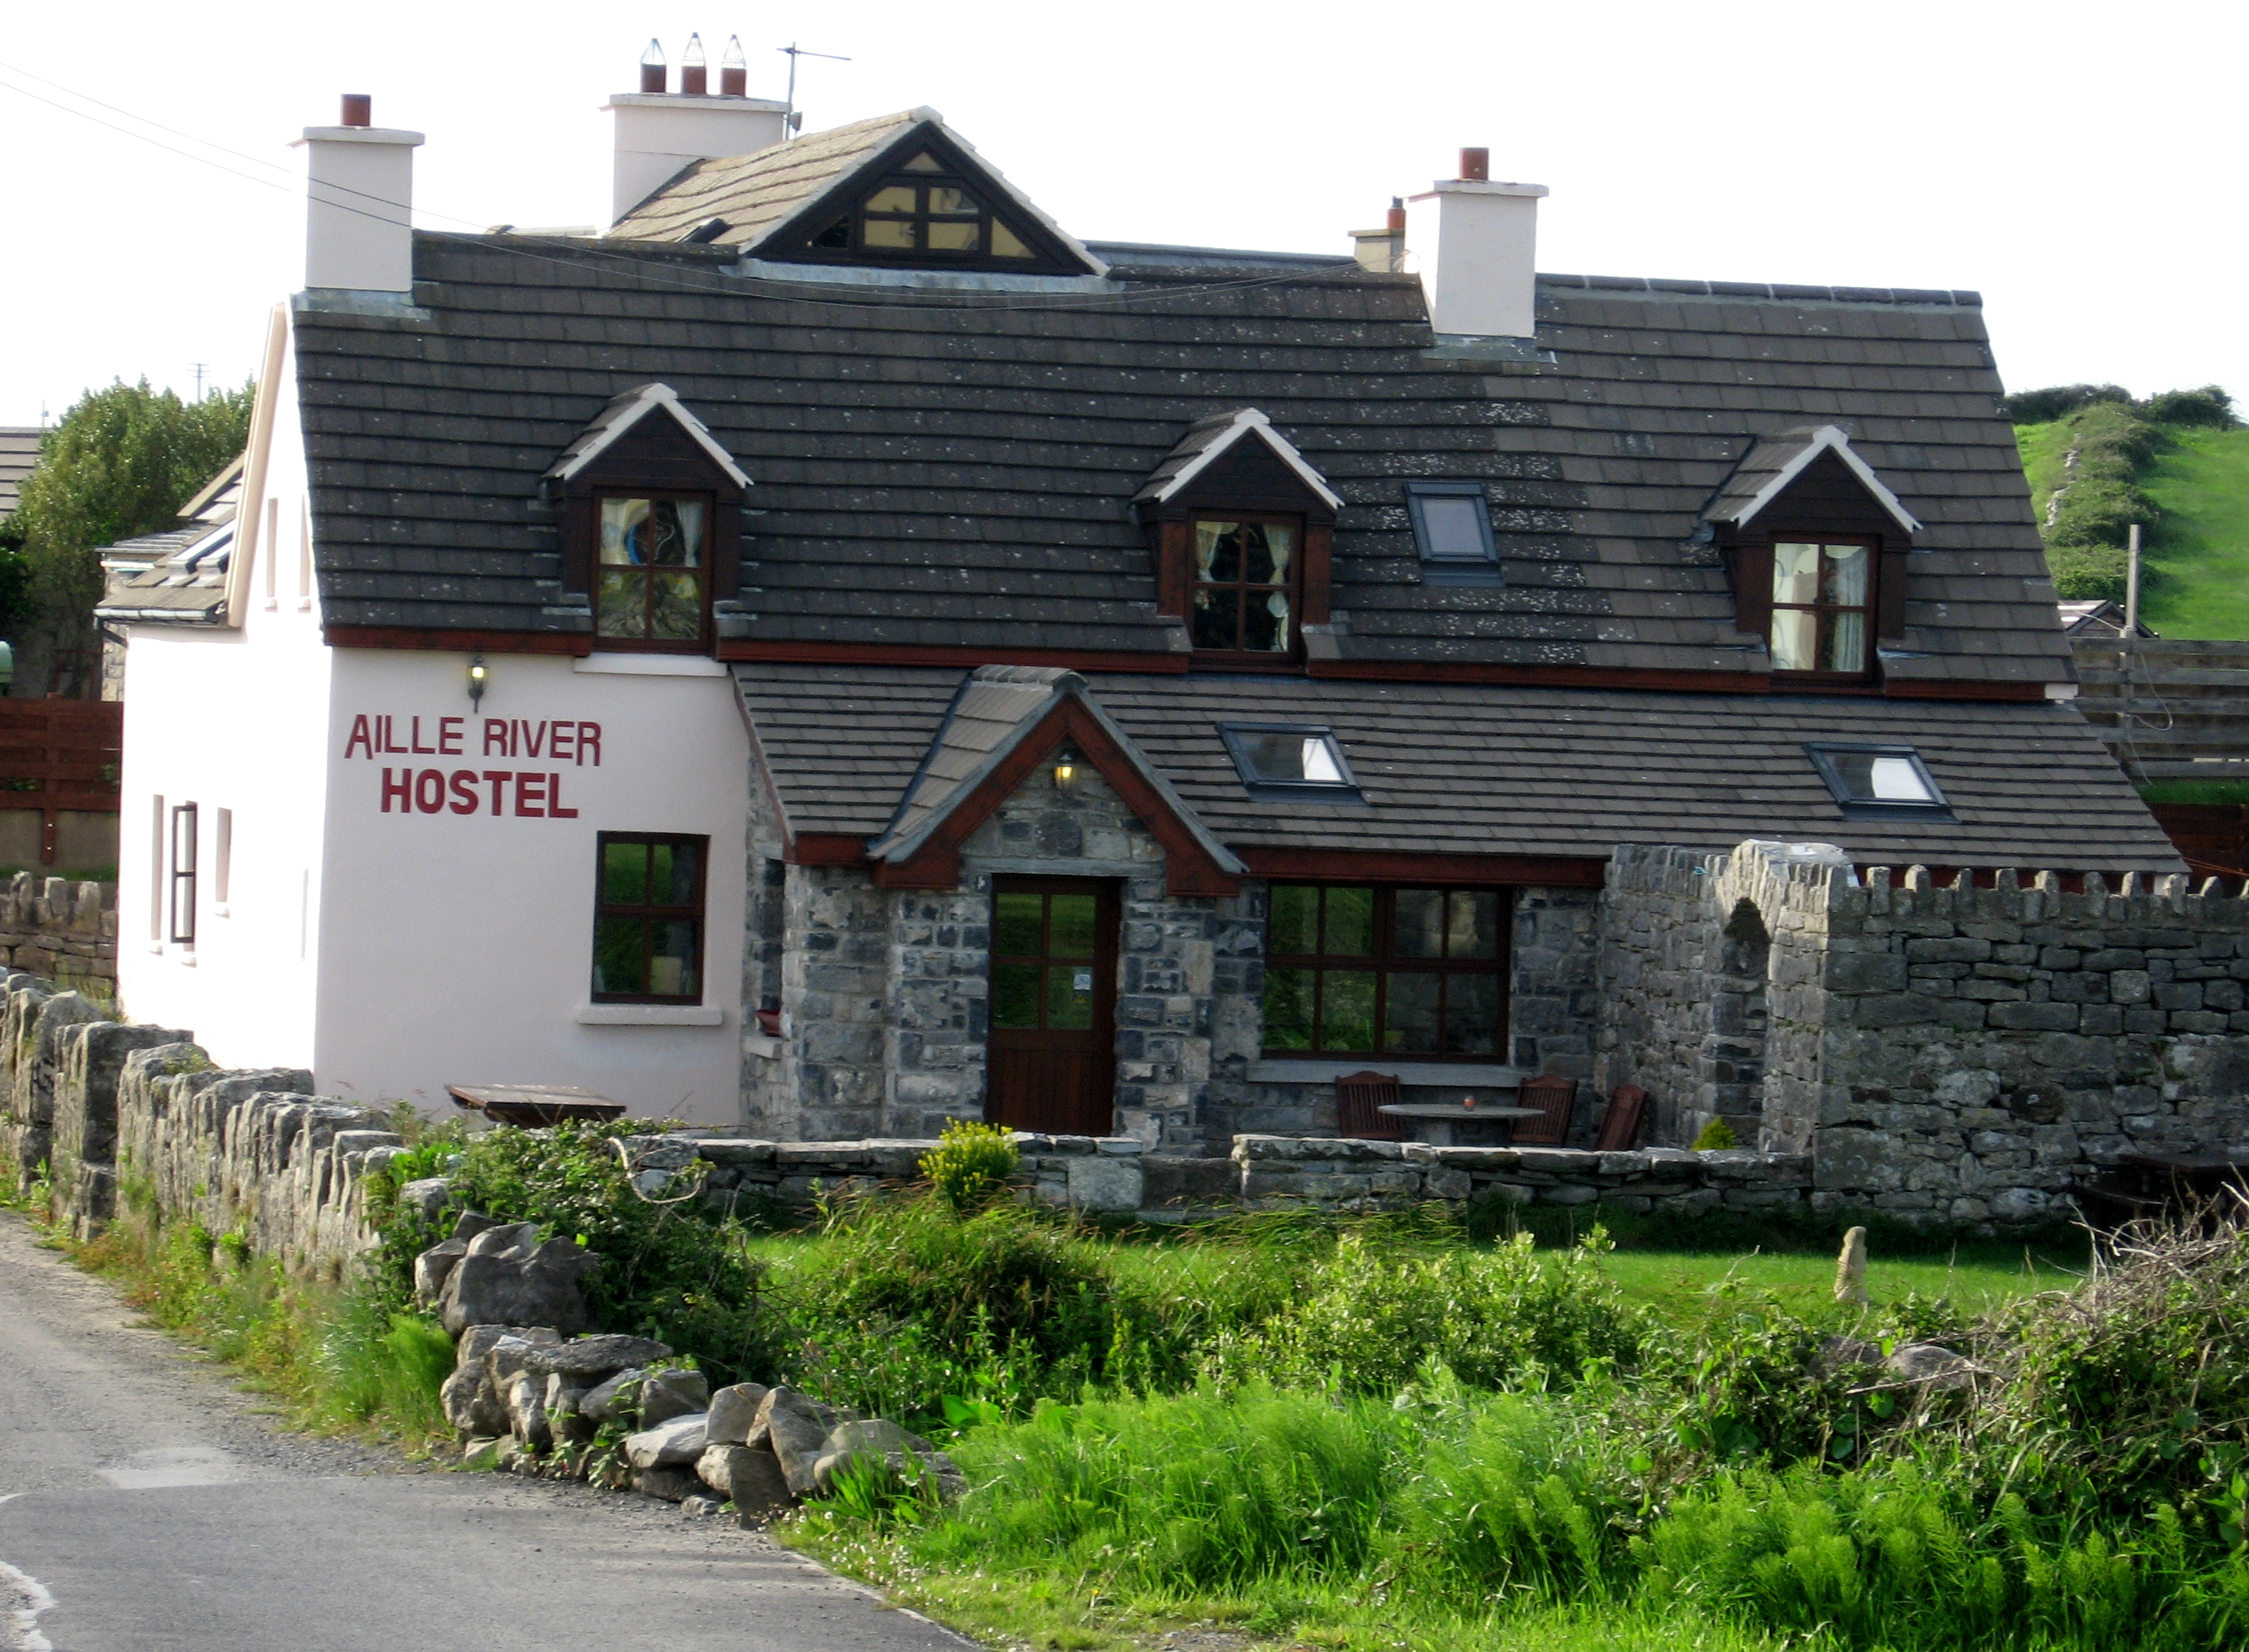 ostello Aille River a Doolin, contea Clare, Irlanda